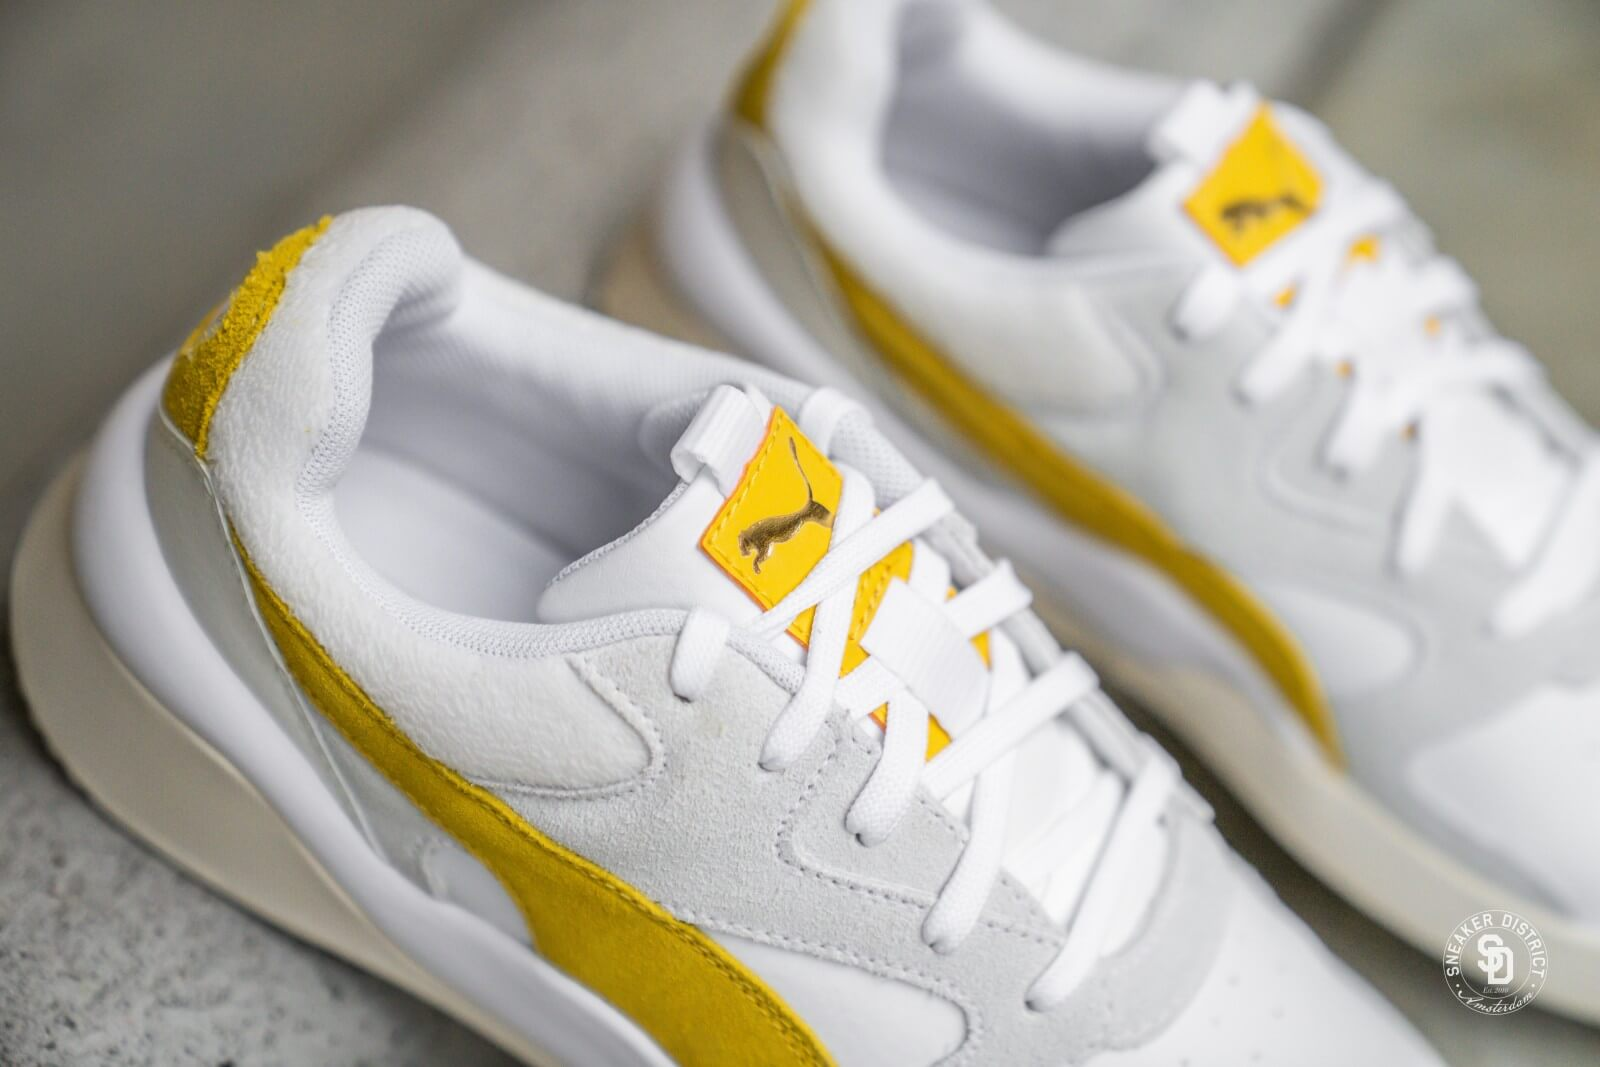 puma yellow and white \u003e Clearance shop